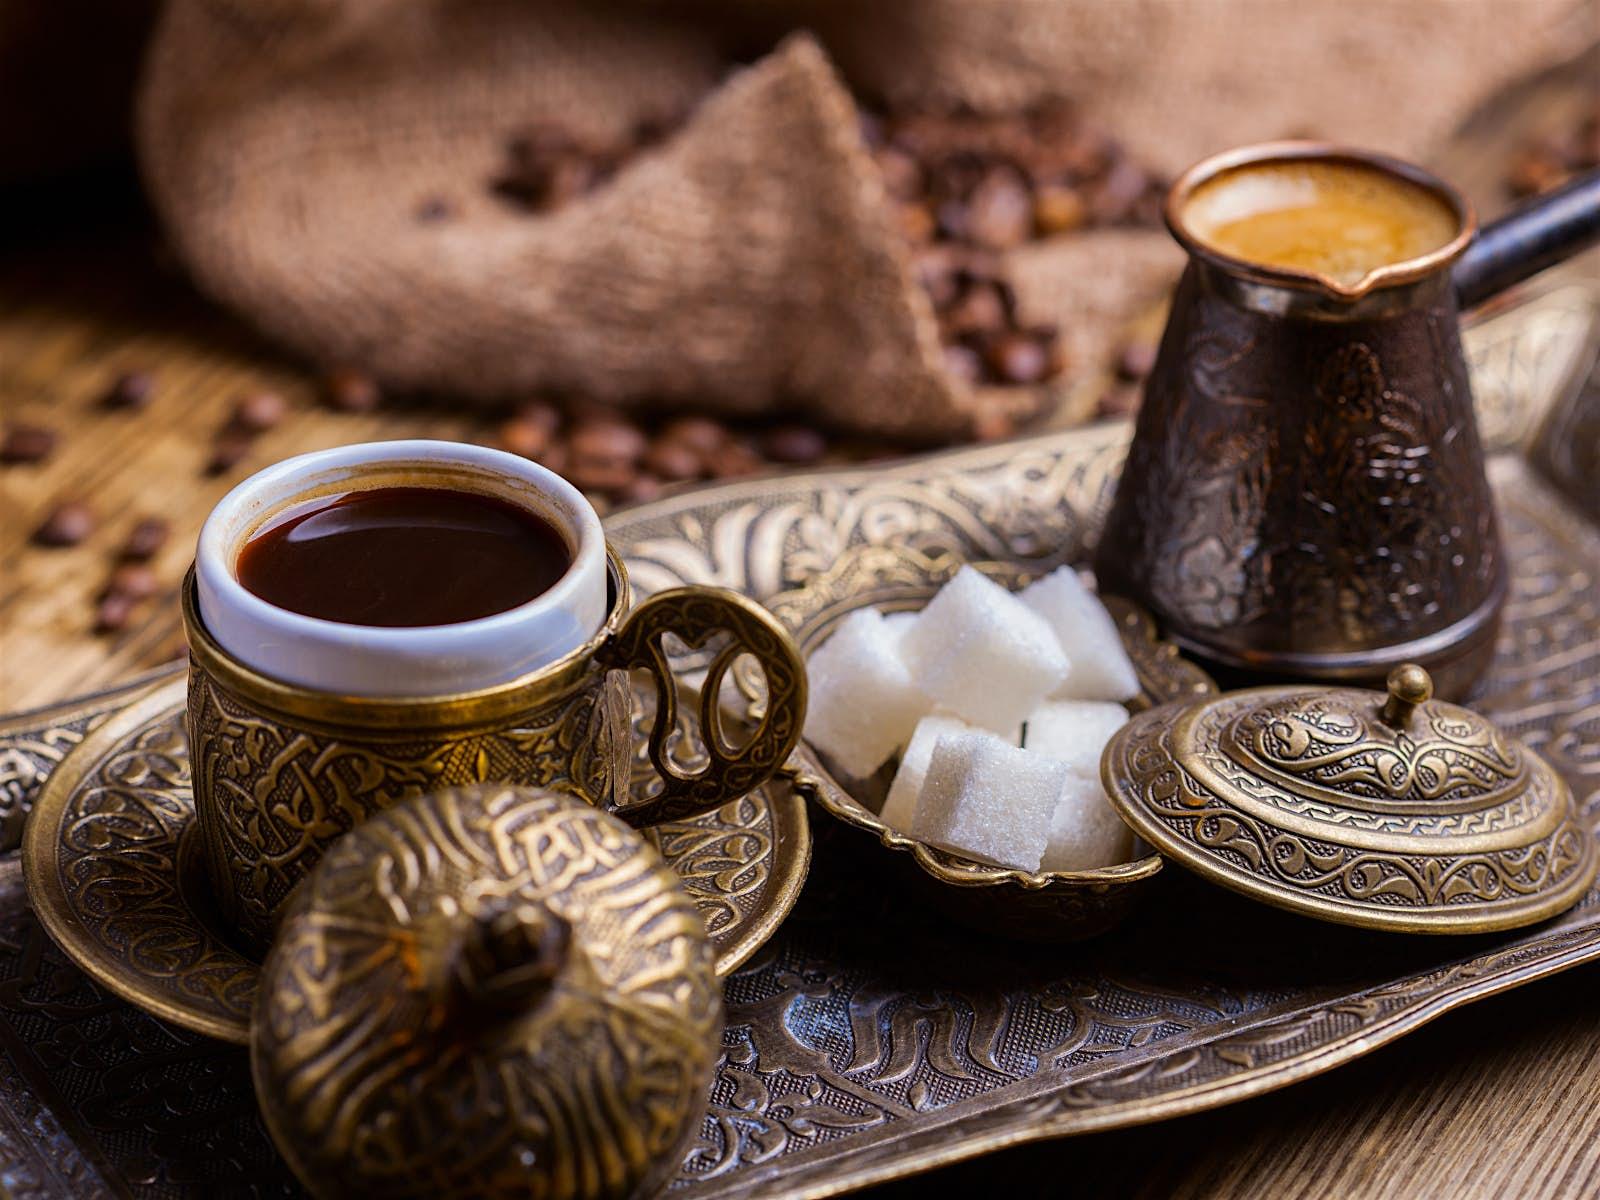 turkish coffee-н зурган илэрц